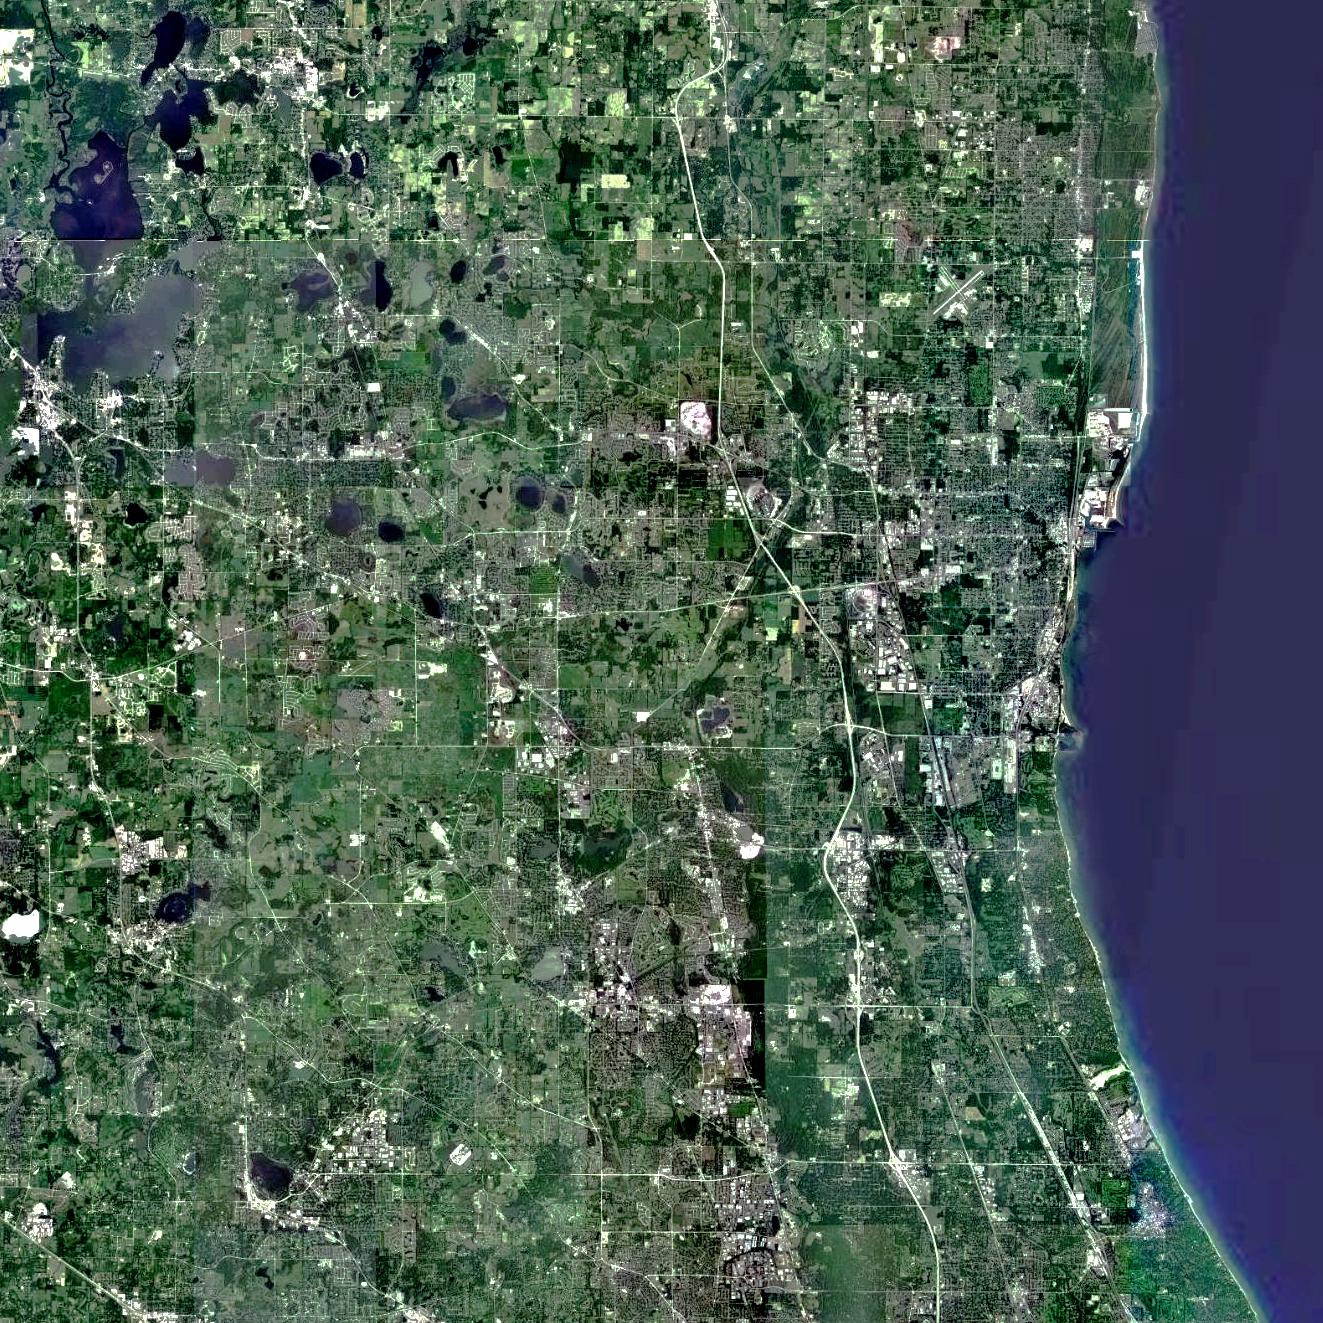 Lake county illinois familypedia fandom powered by wikia solutioingenieria Image collections